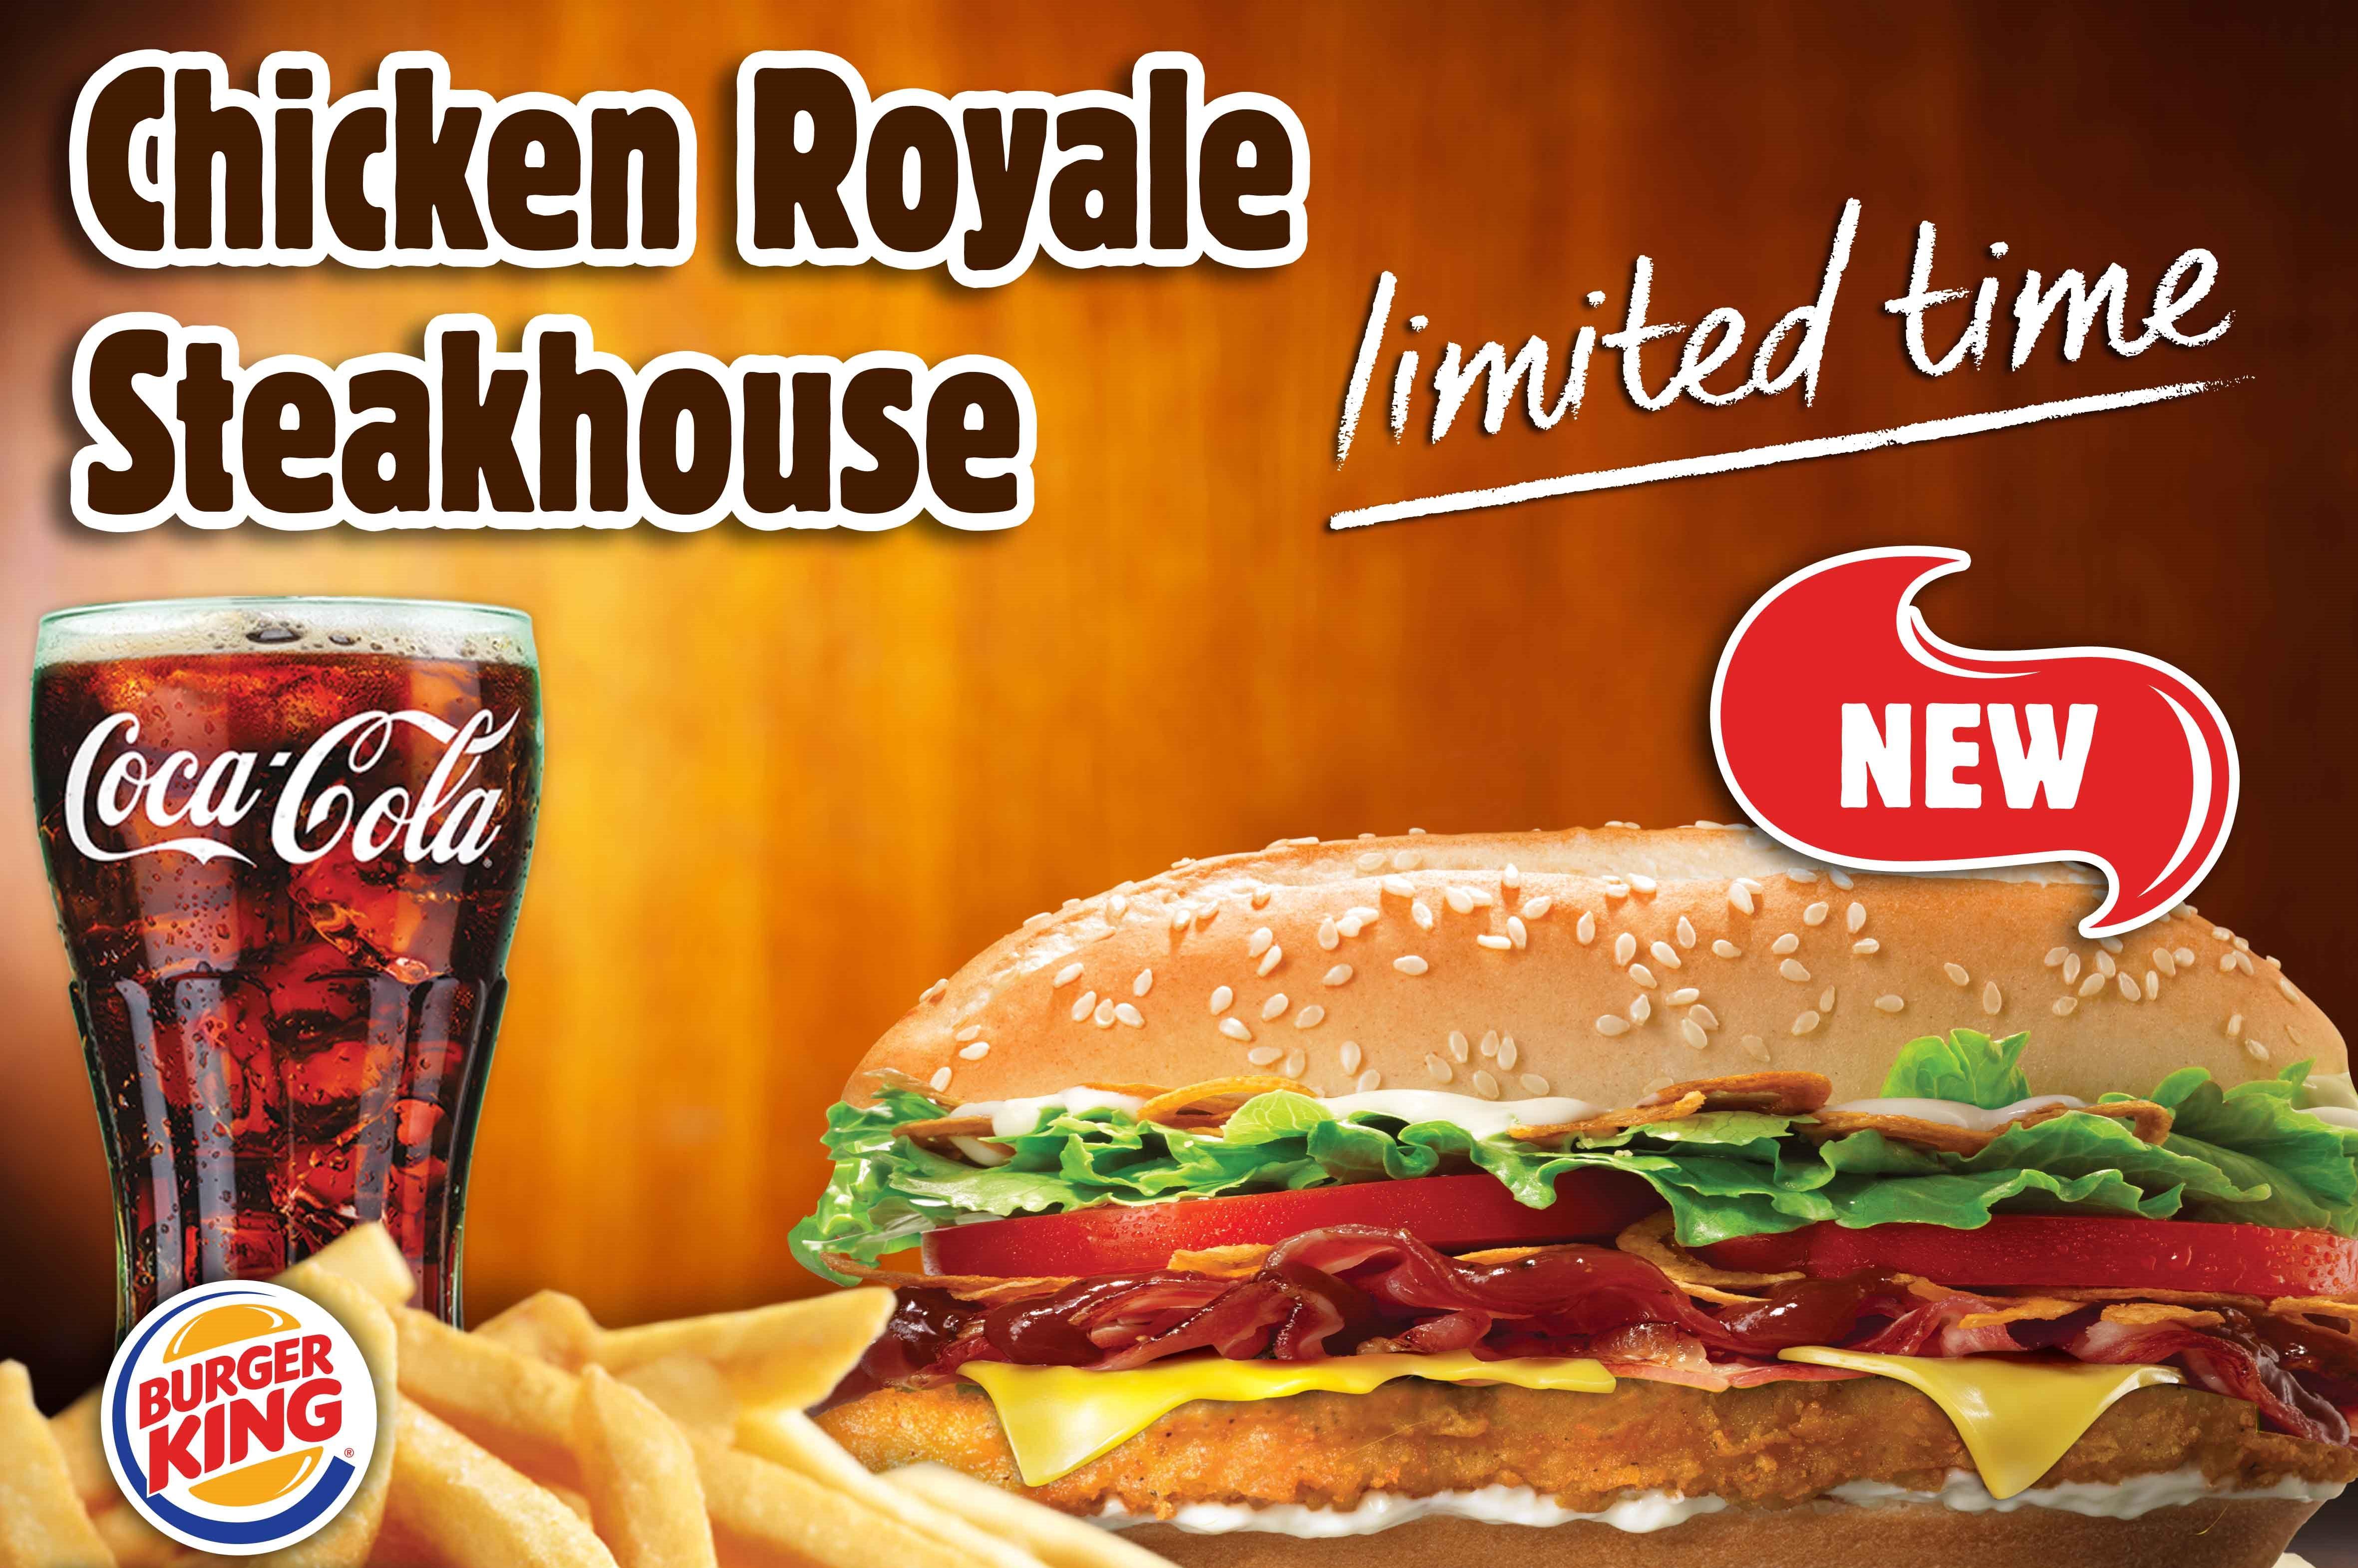 Chicken Royal Steakhouse